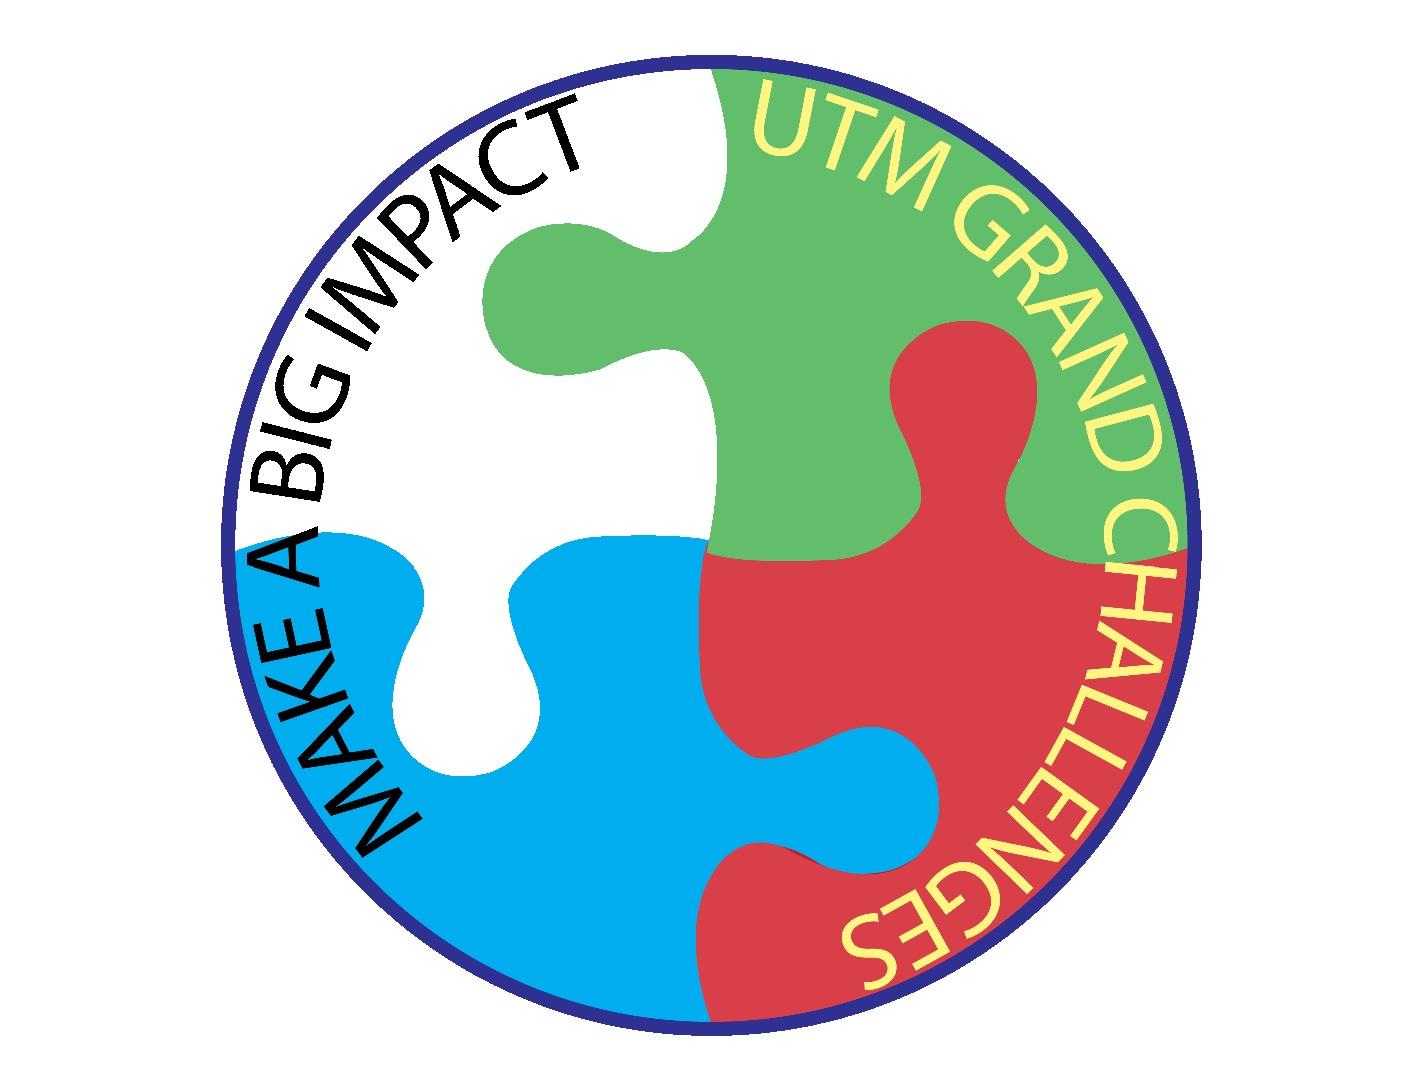 logo gc 2.jpg.1